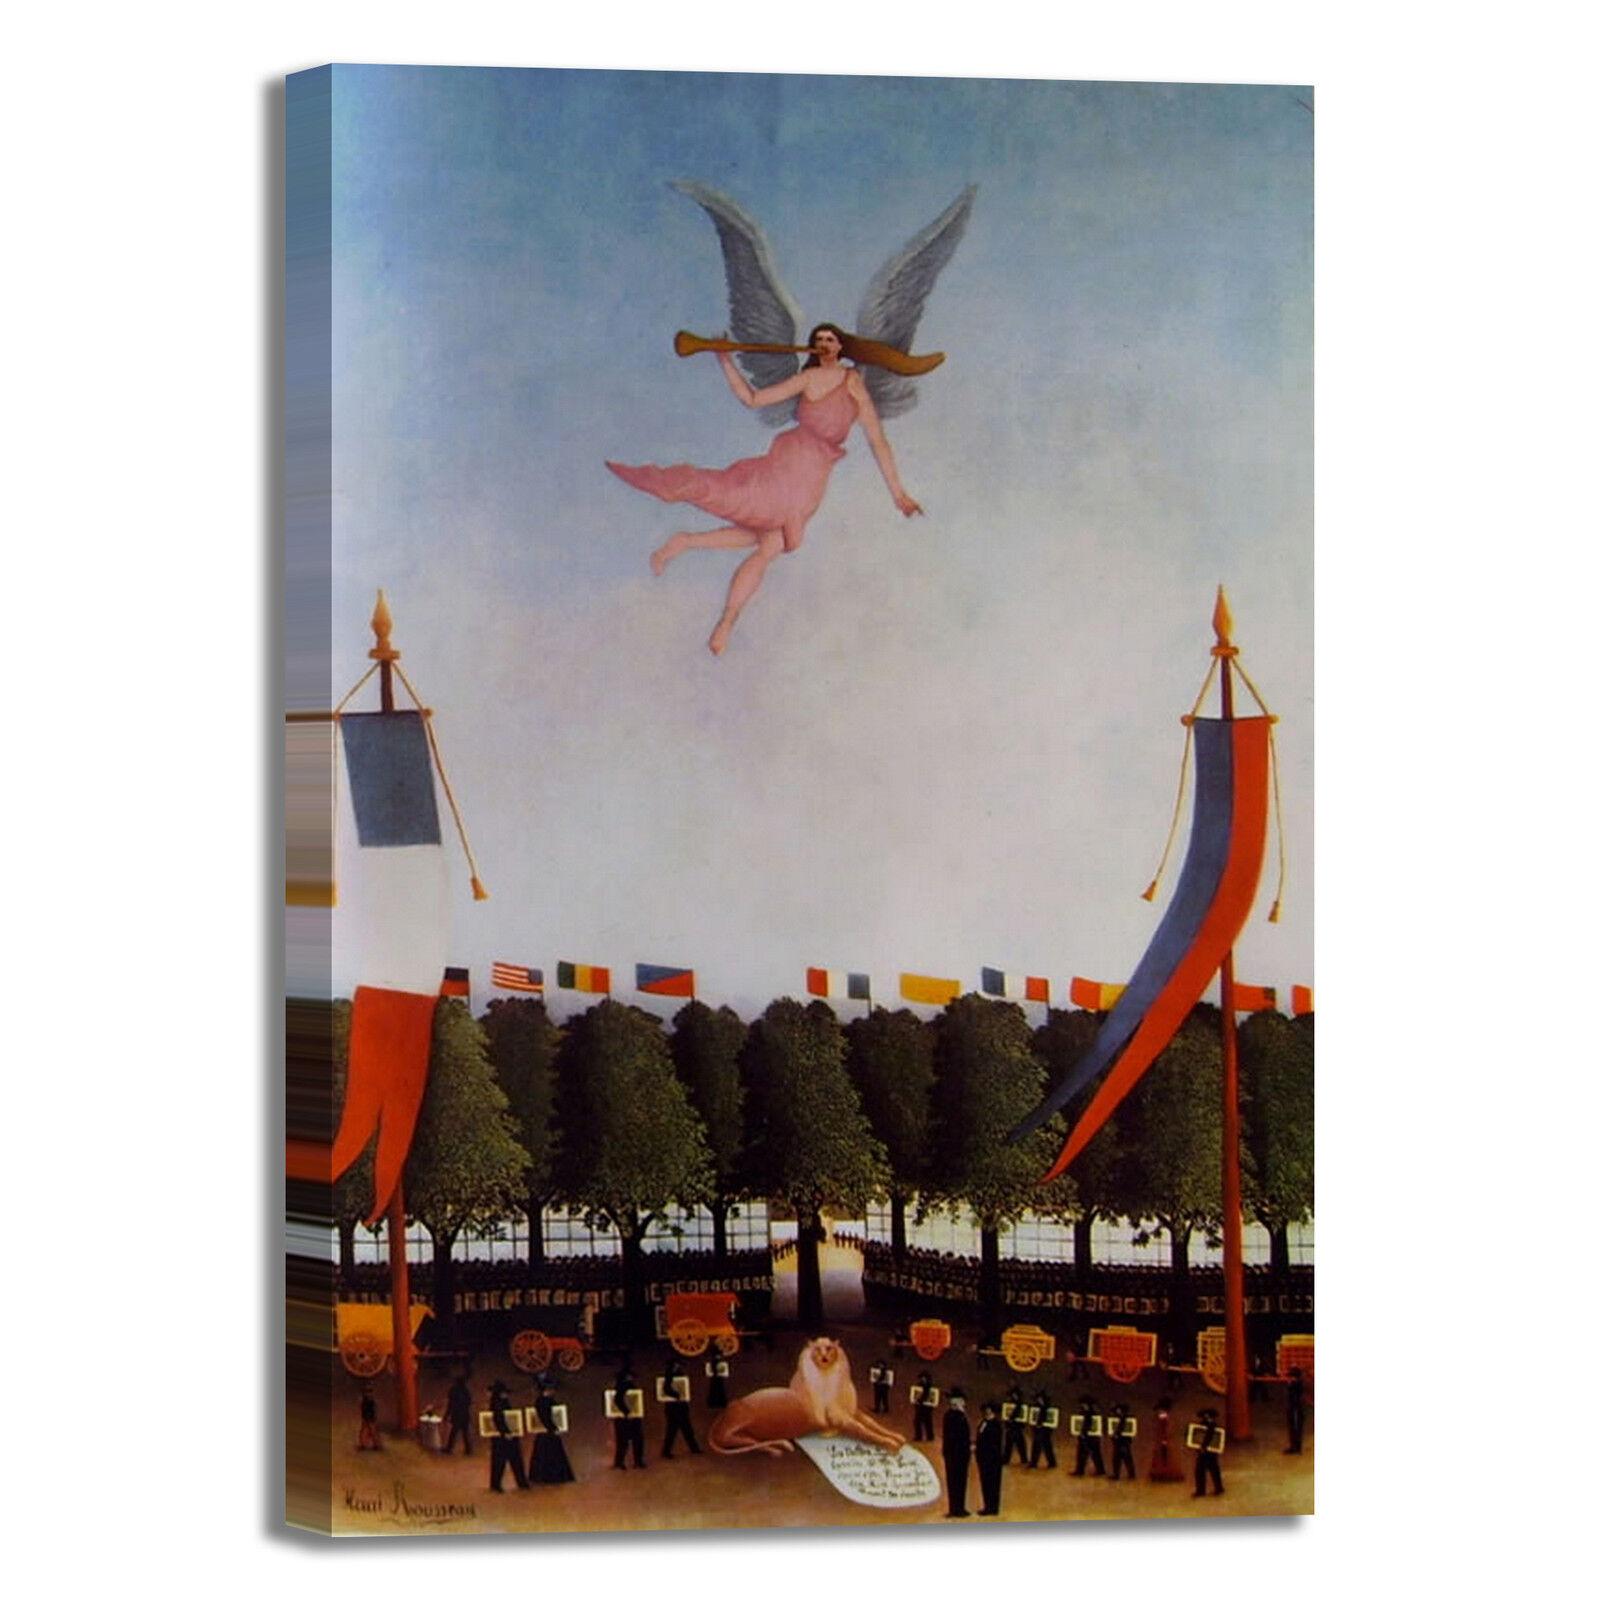 Rousseau la libertà o design quadro stampa tela dipinto telaio arRouge o libertà casa 9204f6